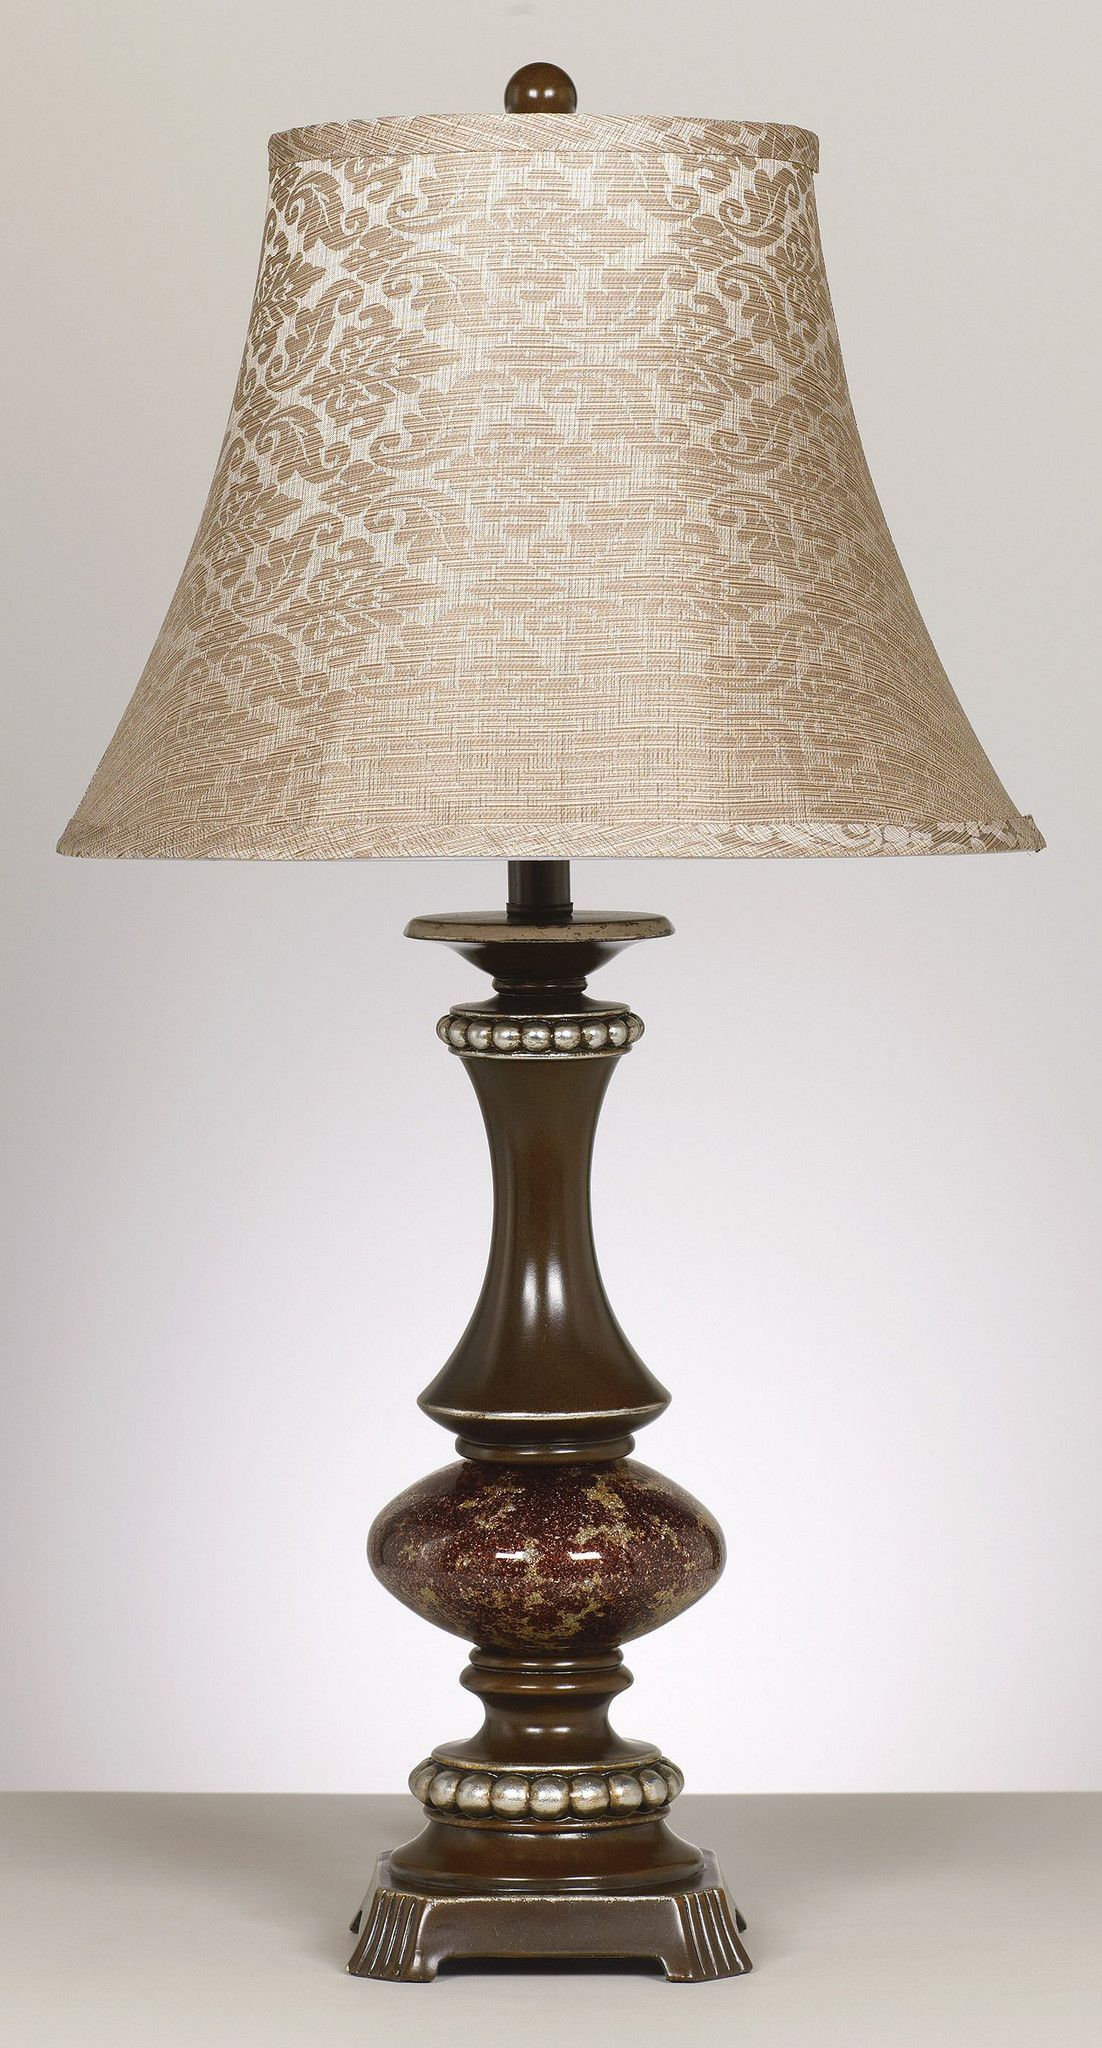 Signature design by ashley lamps feature distinctive and bold designs at super low lampsusa prices each signature design by ashley lamp features a unique